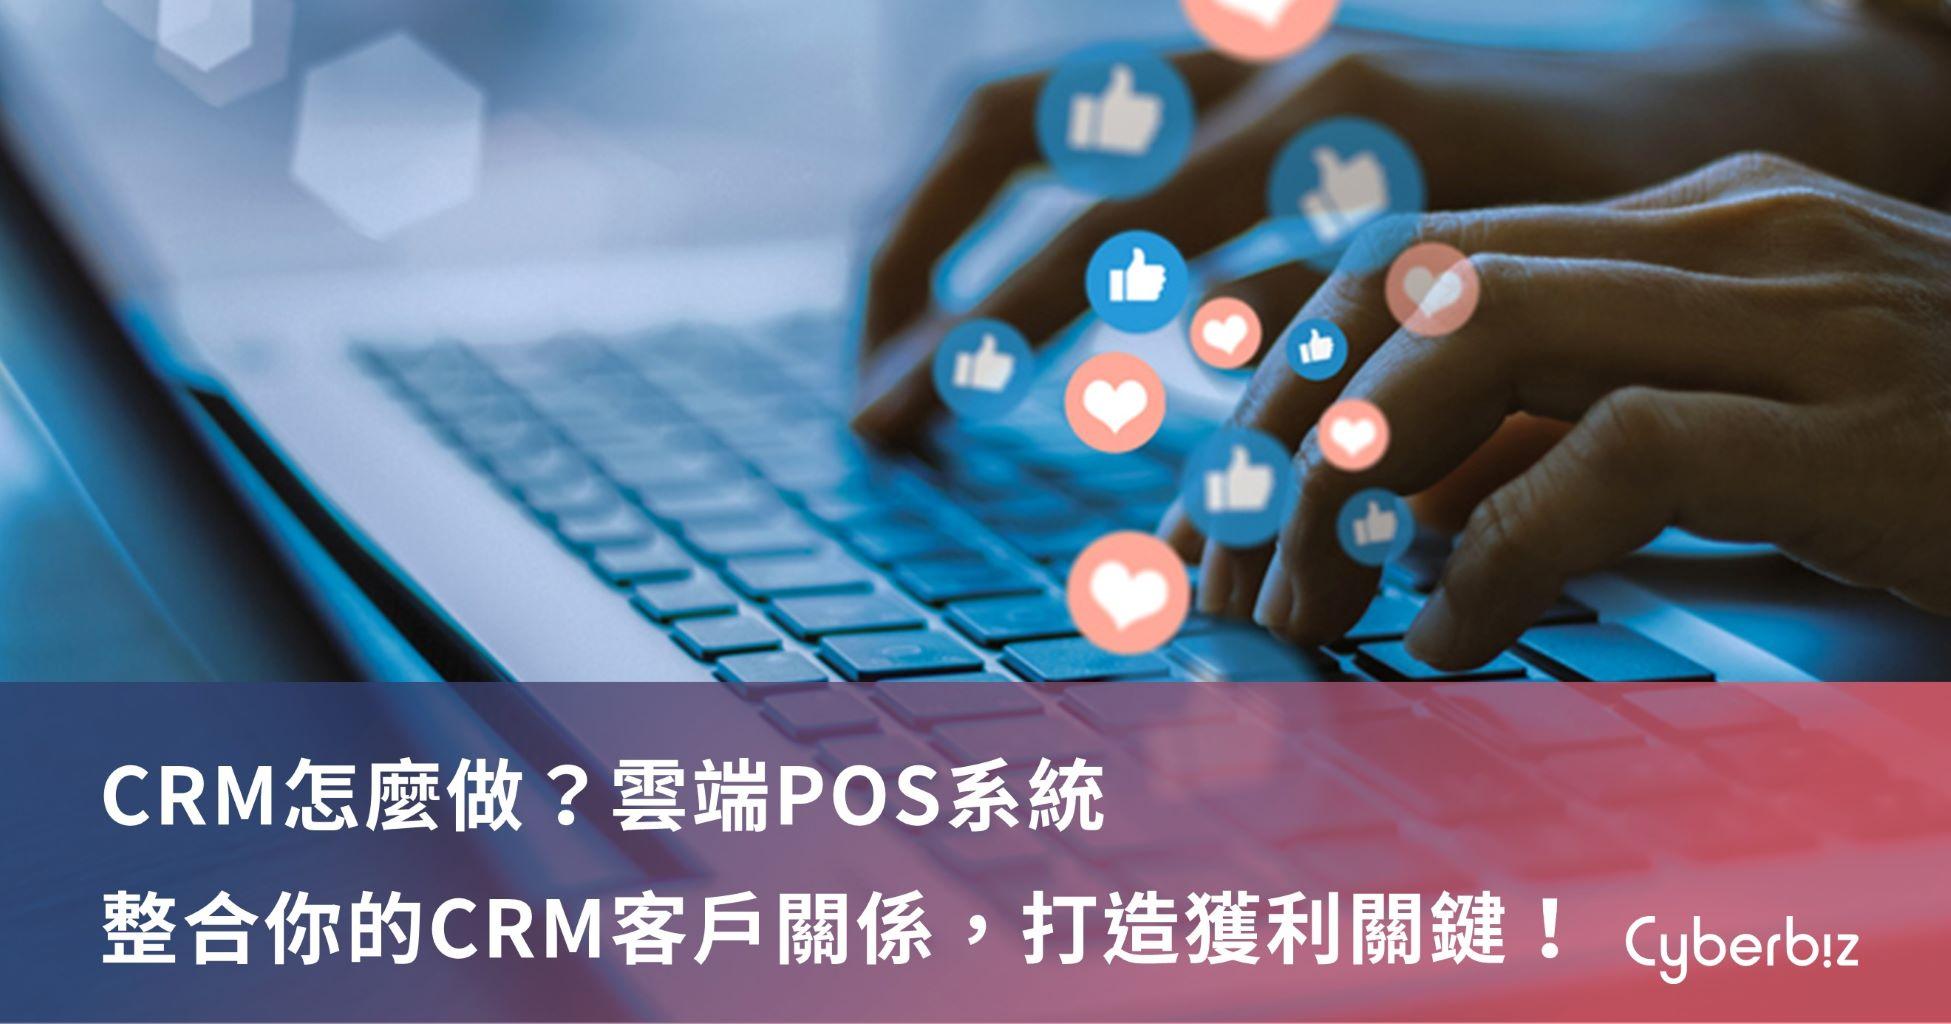 CRM怎麼做?雲端POS系統整合你的CRM客戶關係,打造獲利關鍵!